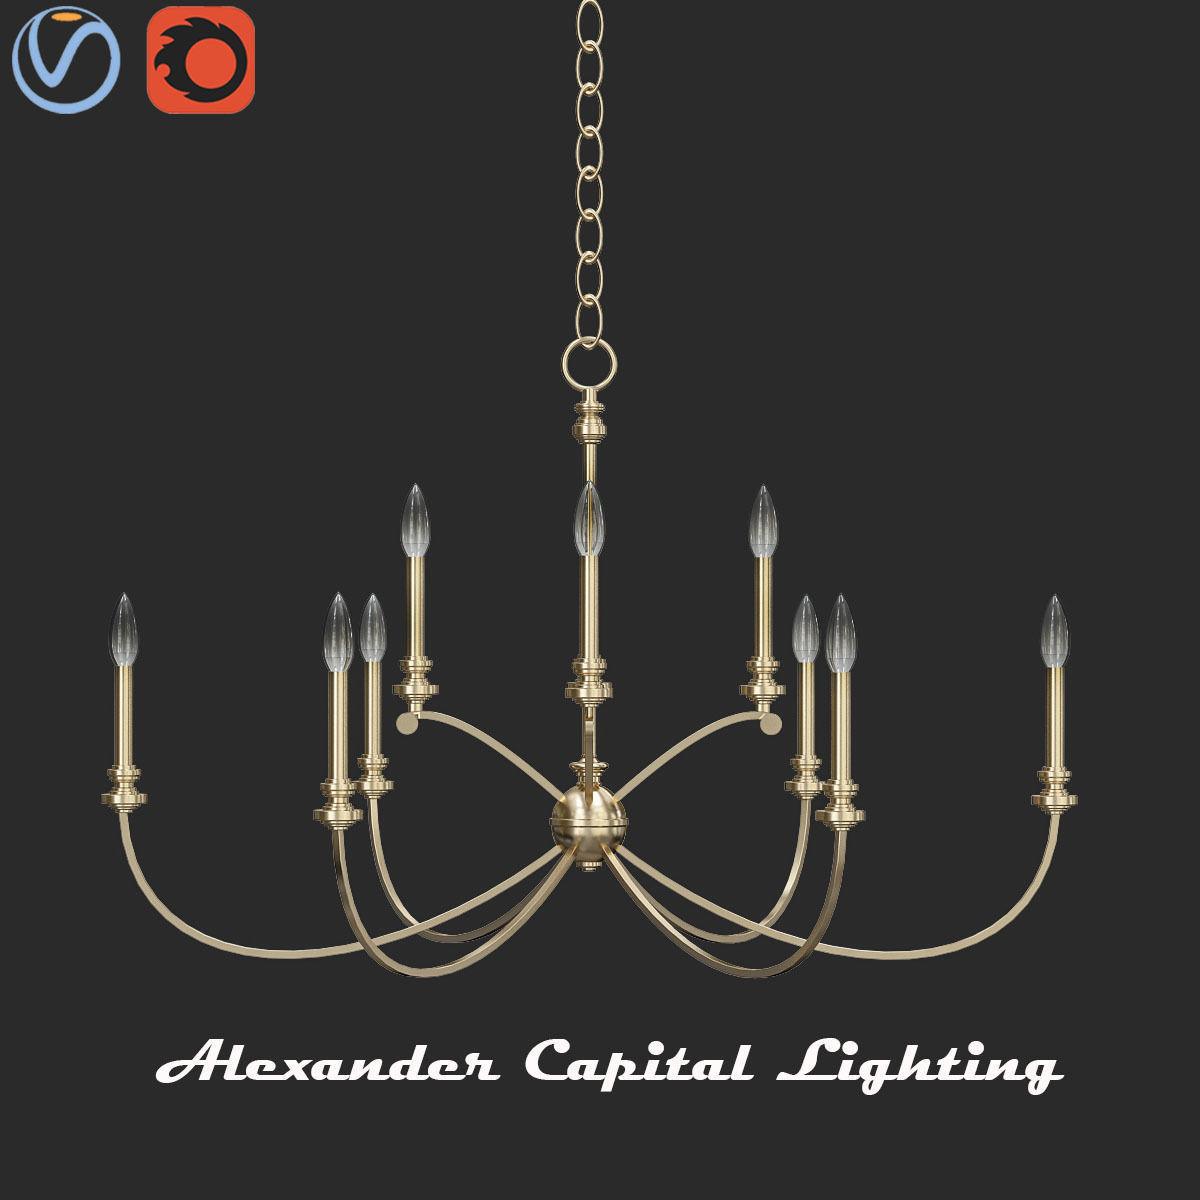 Alexander Capital Lighting Fixture Company Model